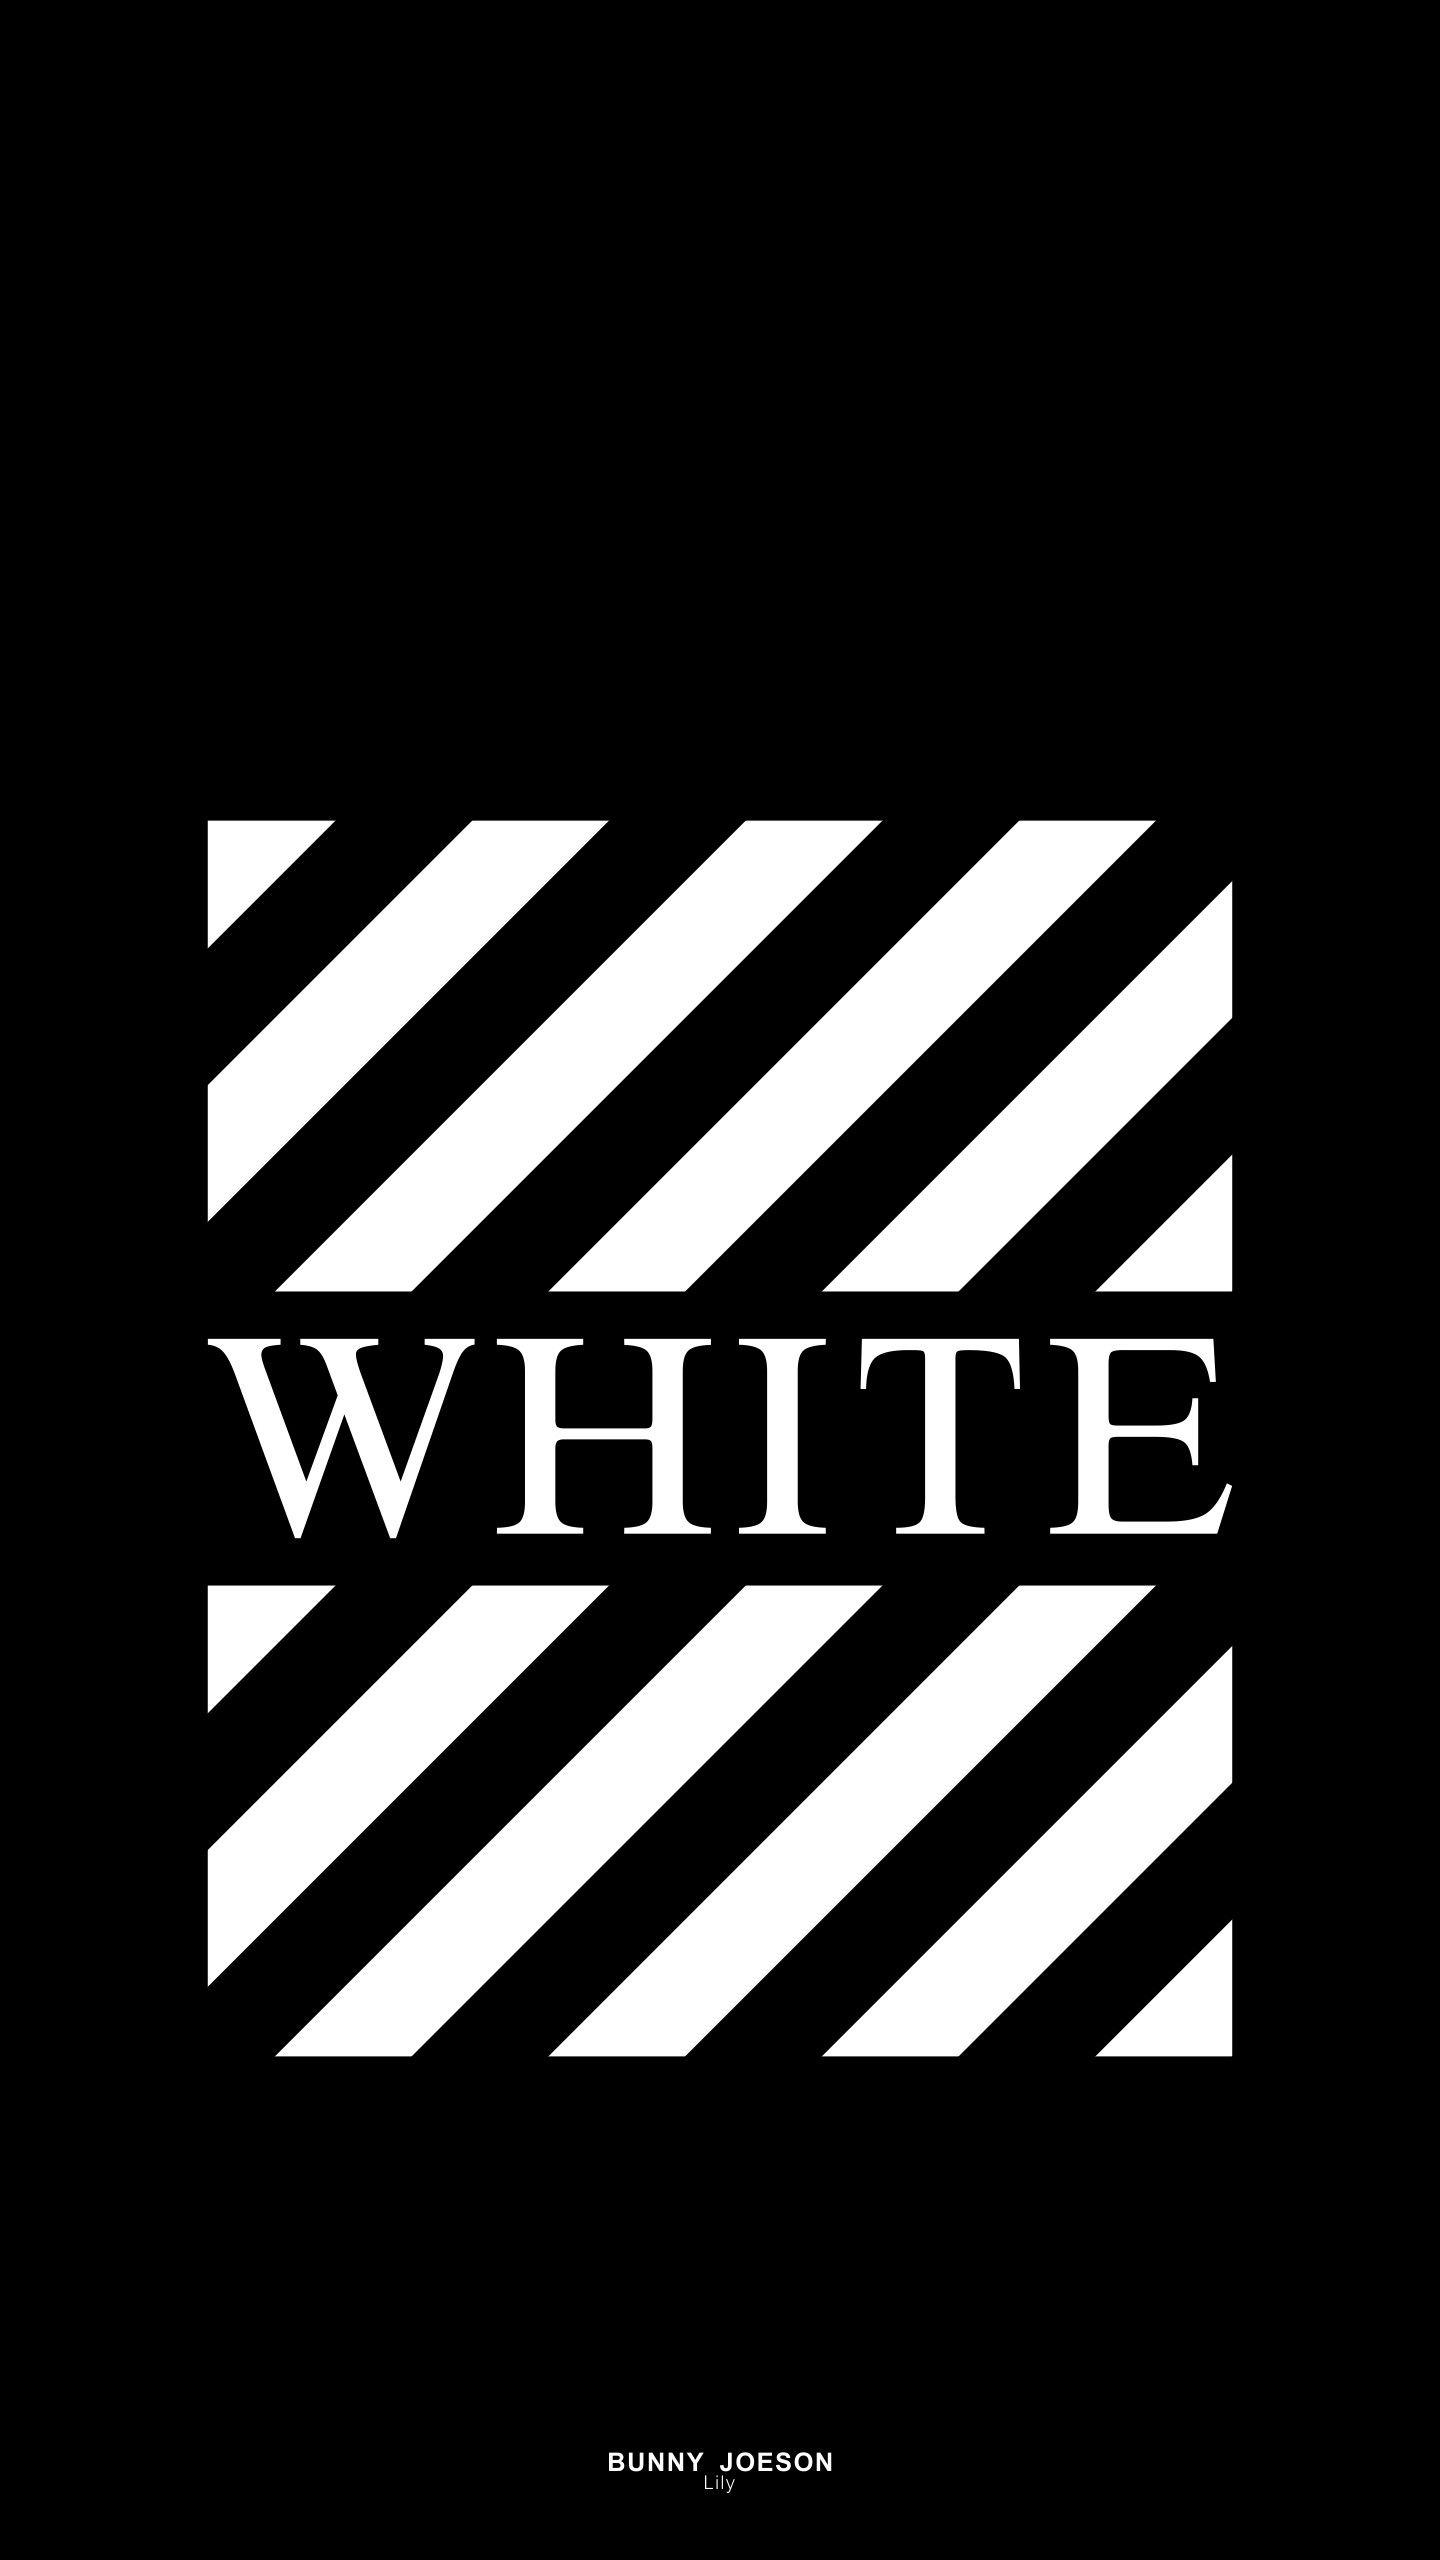 Res 1440x2560 Iphone Phone Life Design Wallpaper Black Wallpaper Wallpaper Off White Swag Wallpaper